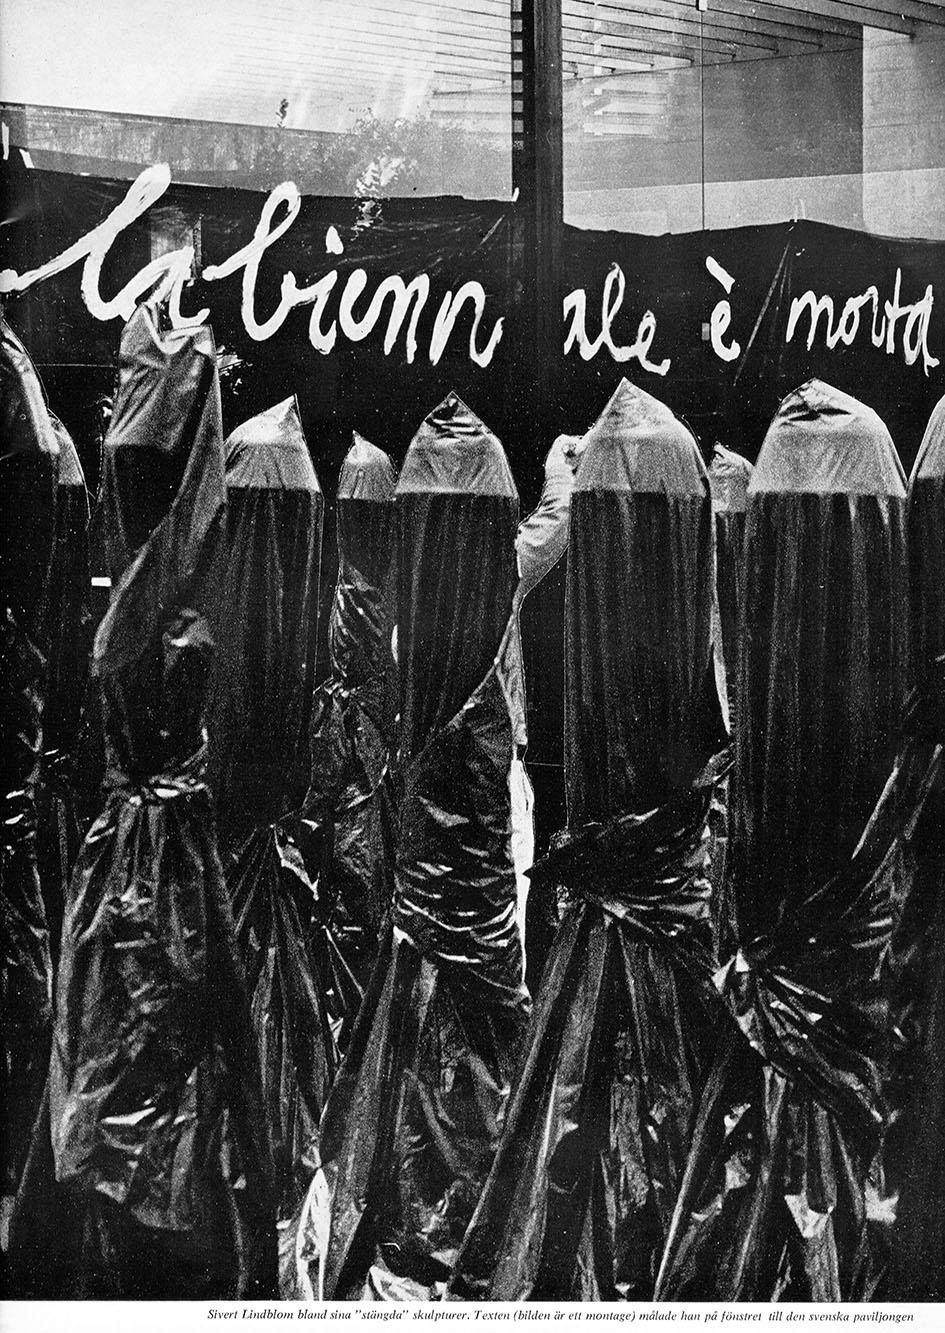 Sivert Lindblom Paletten Nr 2 1968 2-